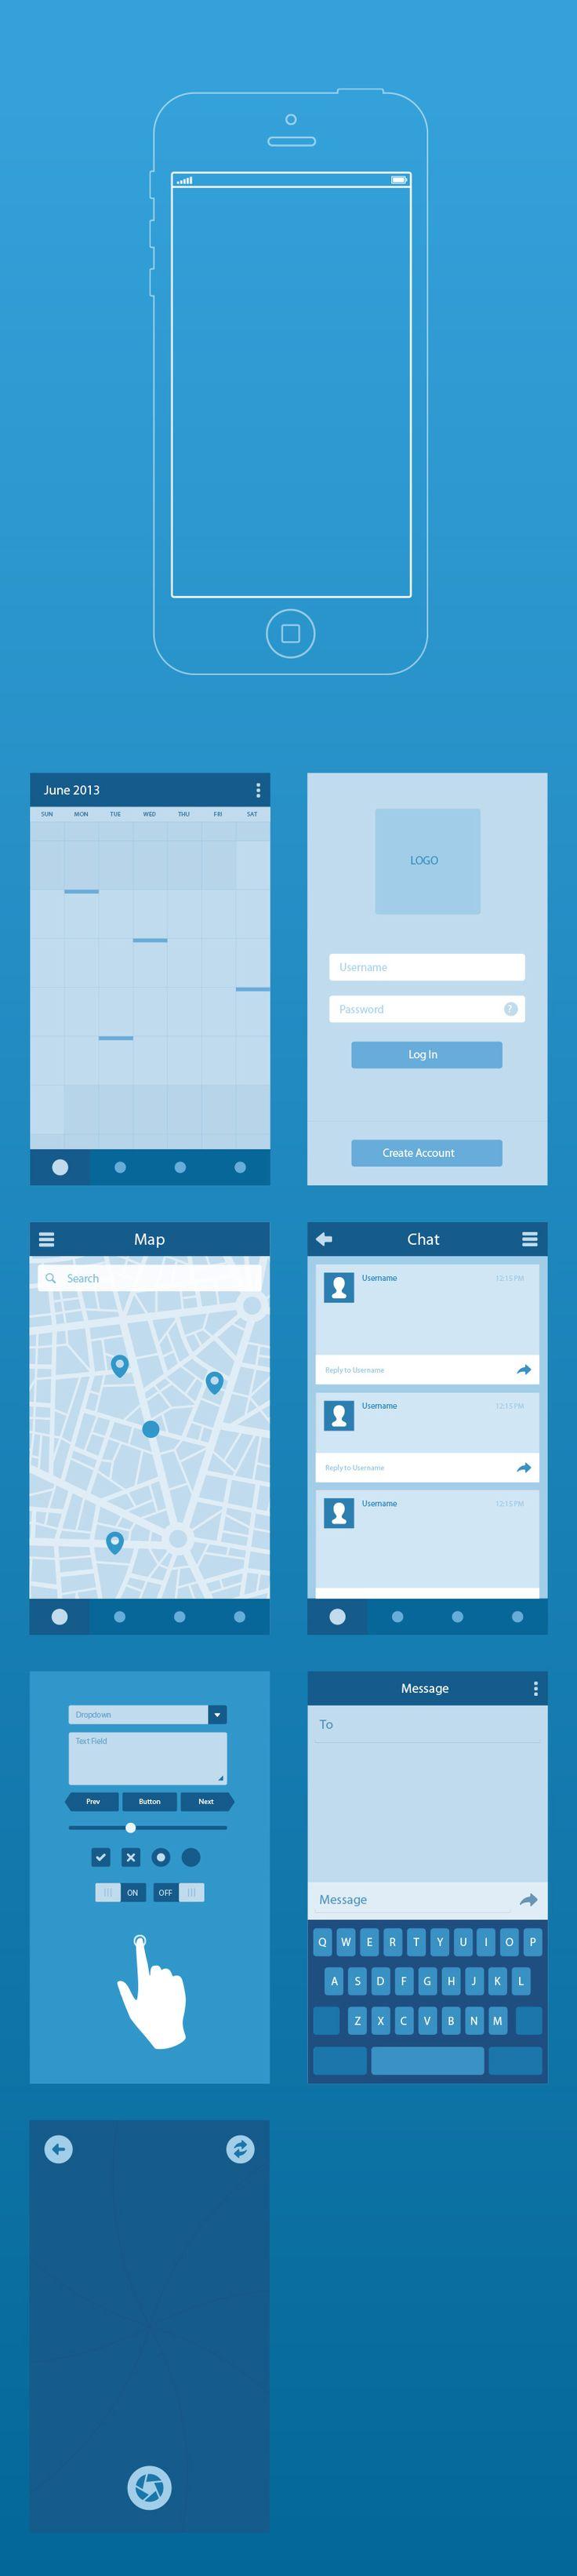 Get your design freebie -  UI8 Wireframe Kit #template #uikit #vector #ai #freebies #uidesign